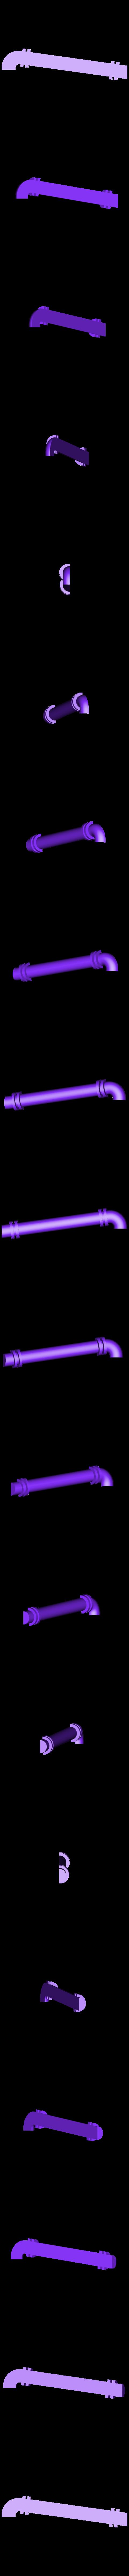 MirrorSteam_Pipe_-_Back_Engine-D.STL Download free STL file 4-8-8-4 Big Boy Locomotive • 3D printer object, RaymondDeLuca